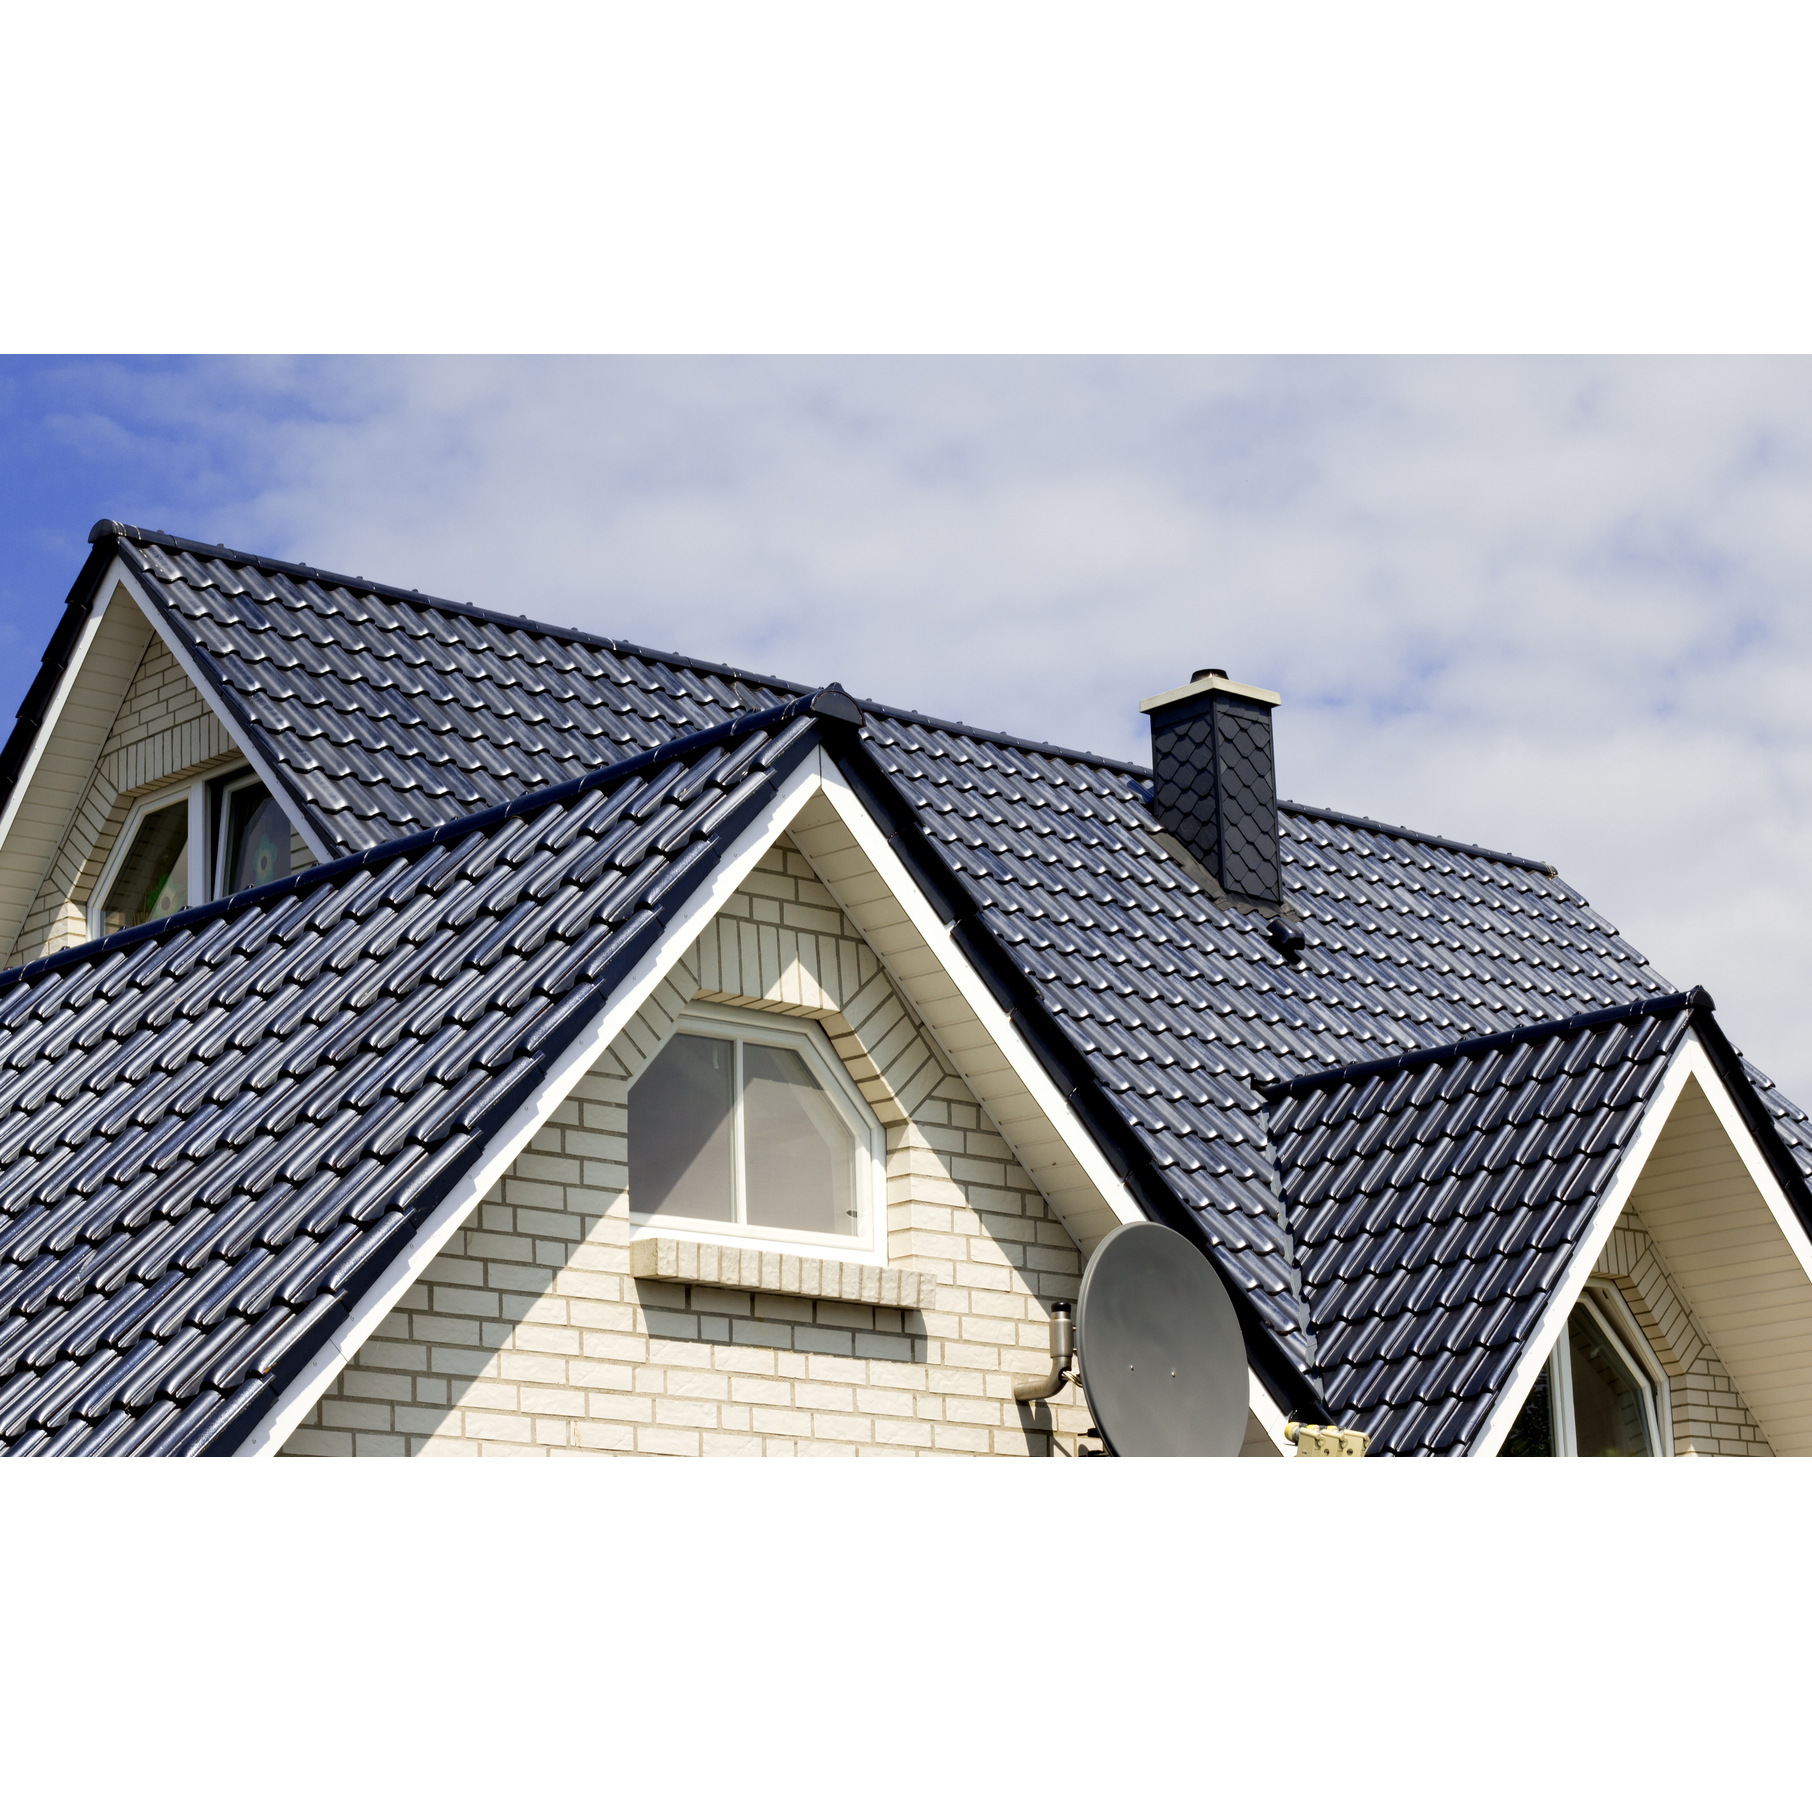 Carl Bennett Roofing Co - Louisville, TN - Roofing Contractors